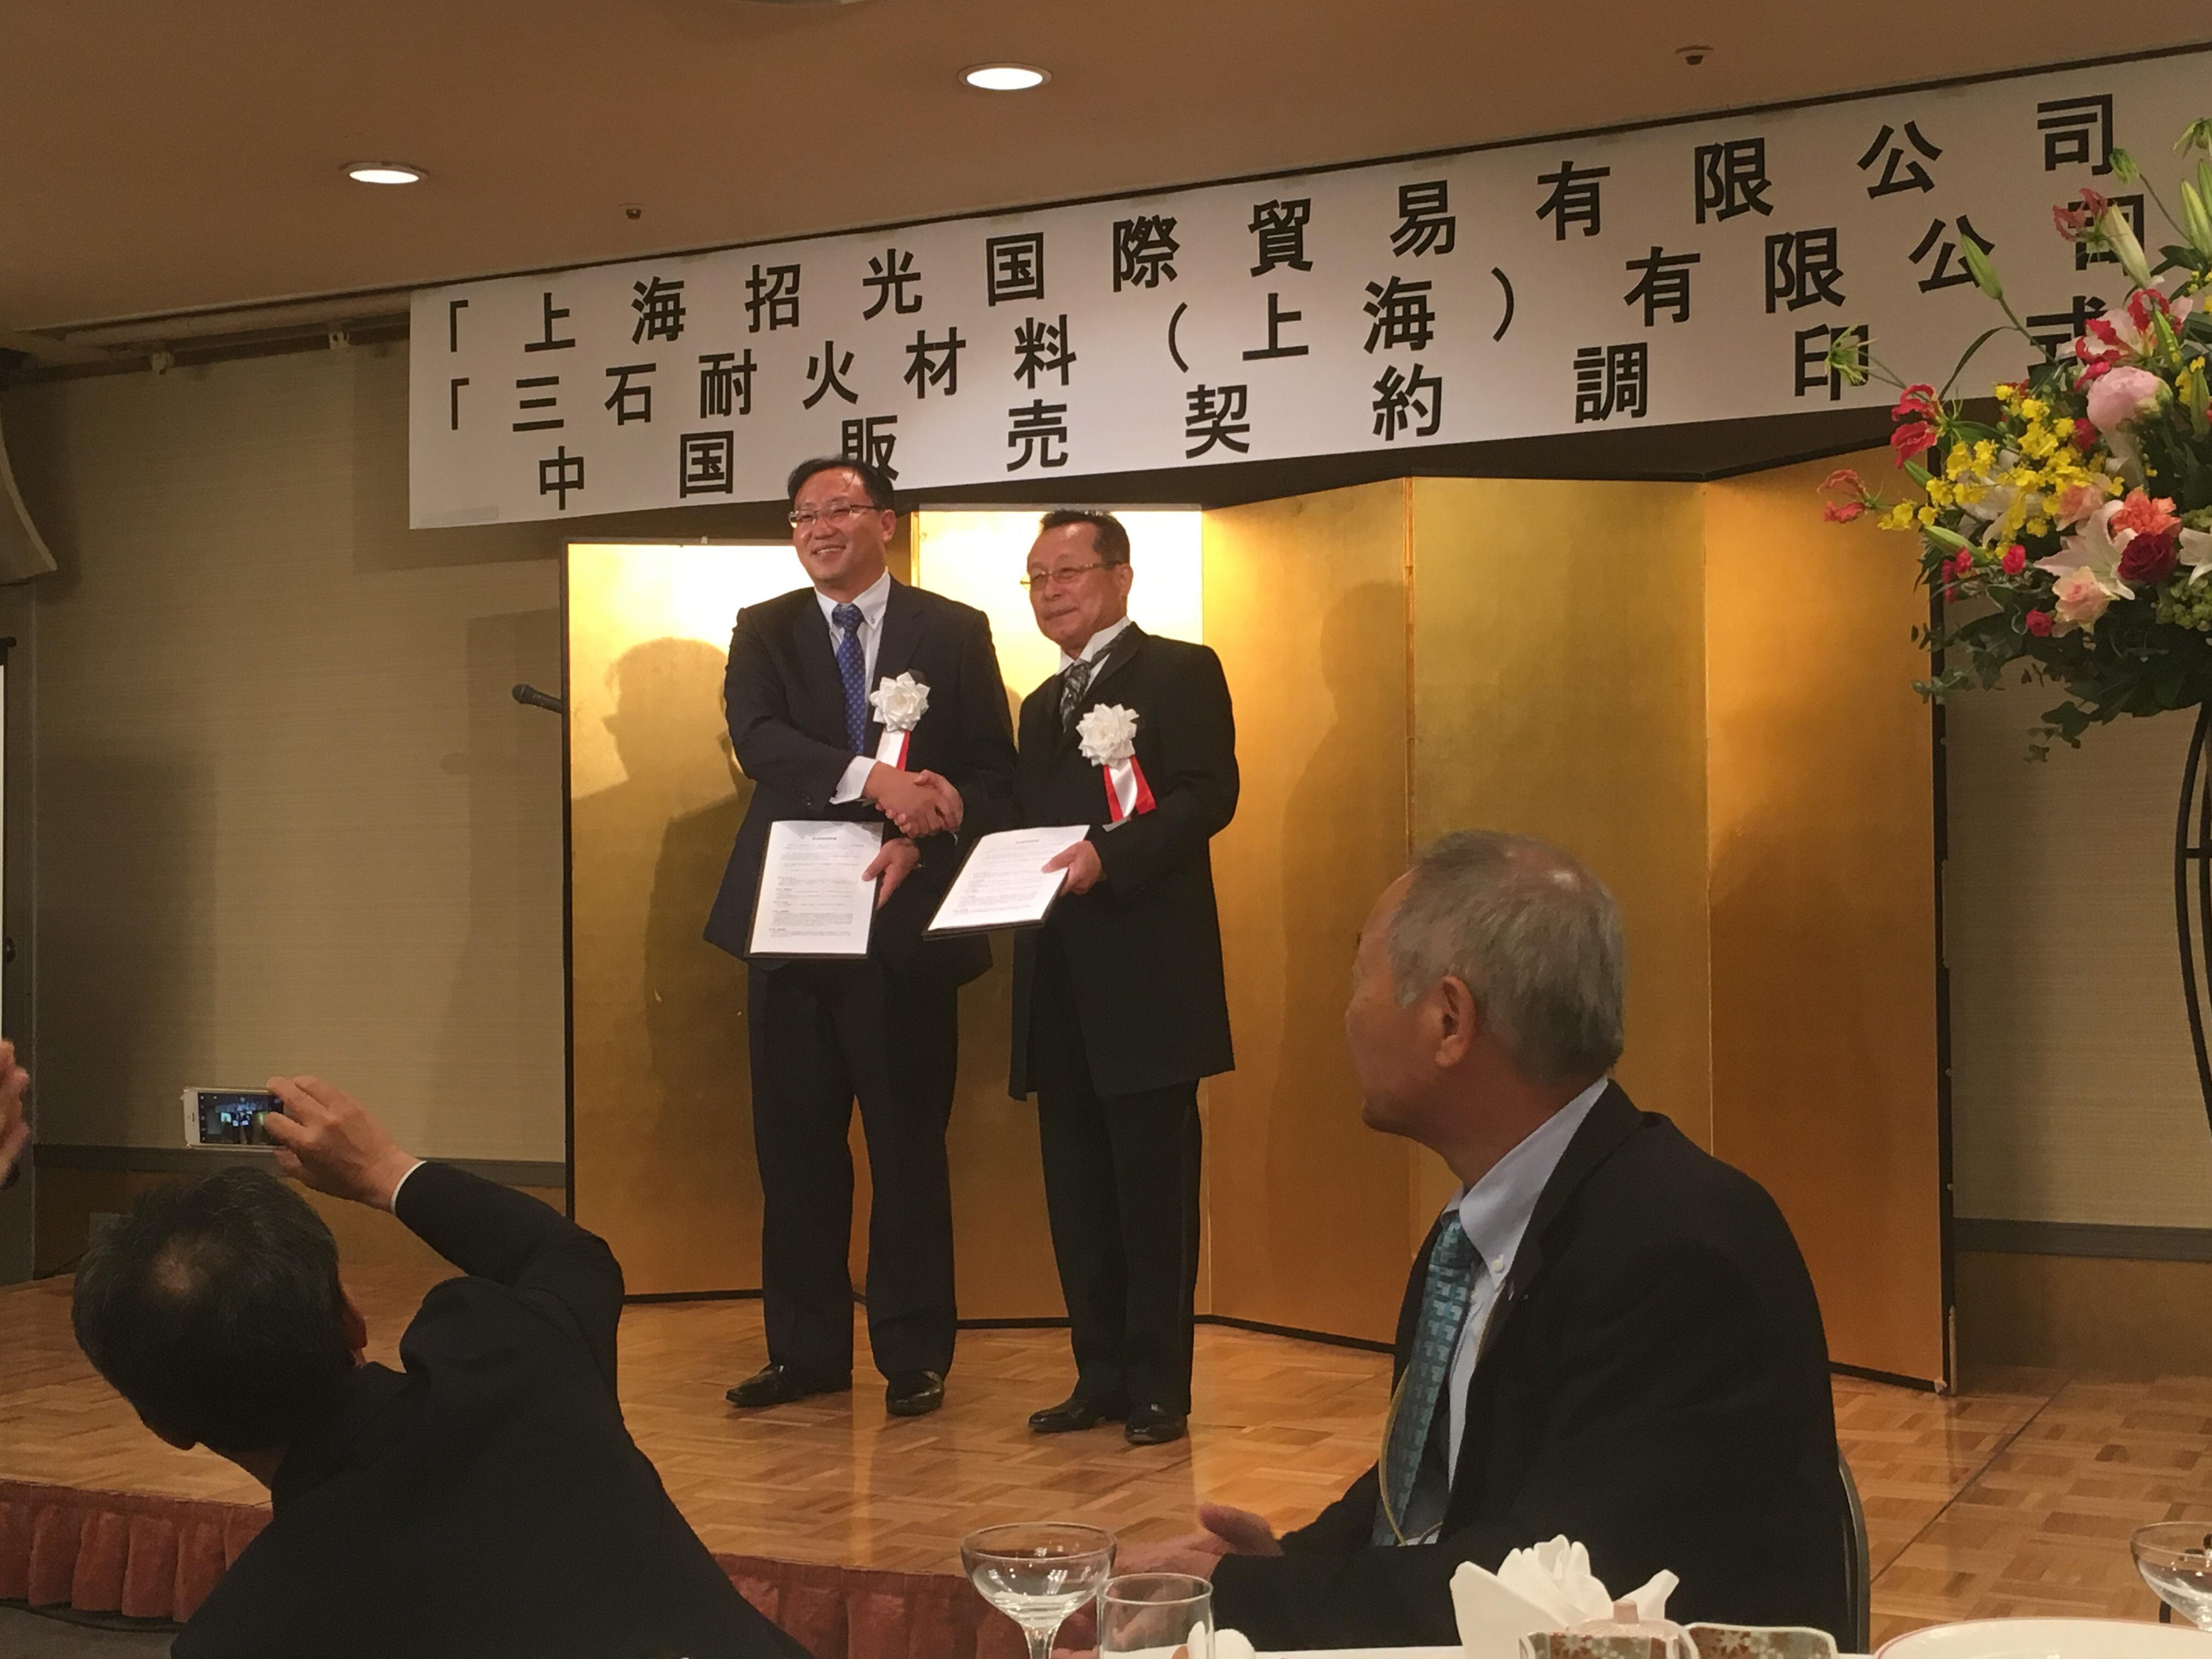 上海招光国際貿易有限公司様と、販売契約を締結